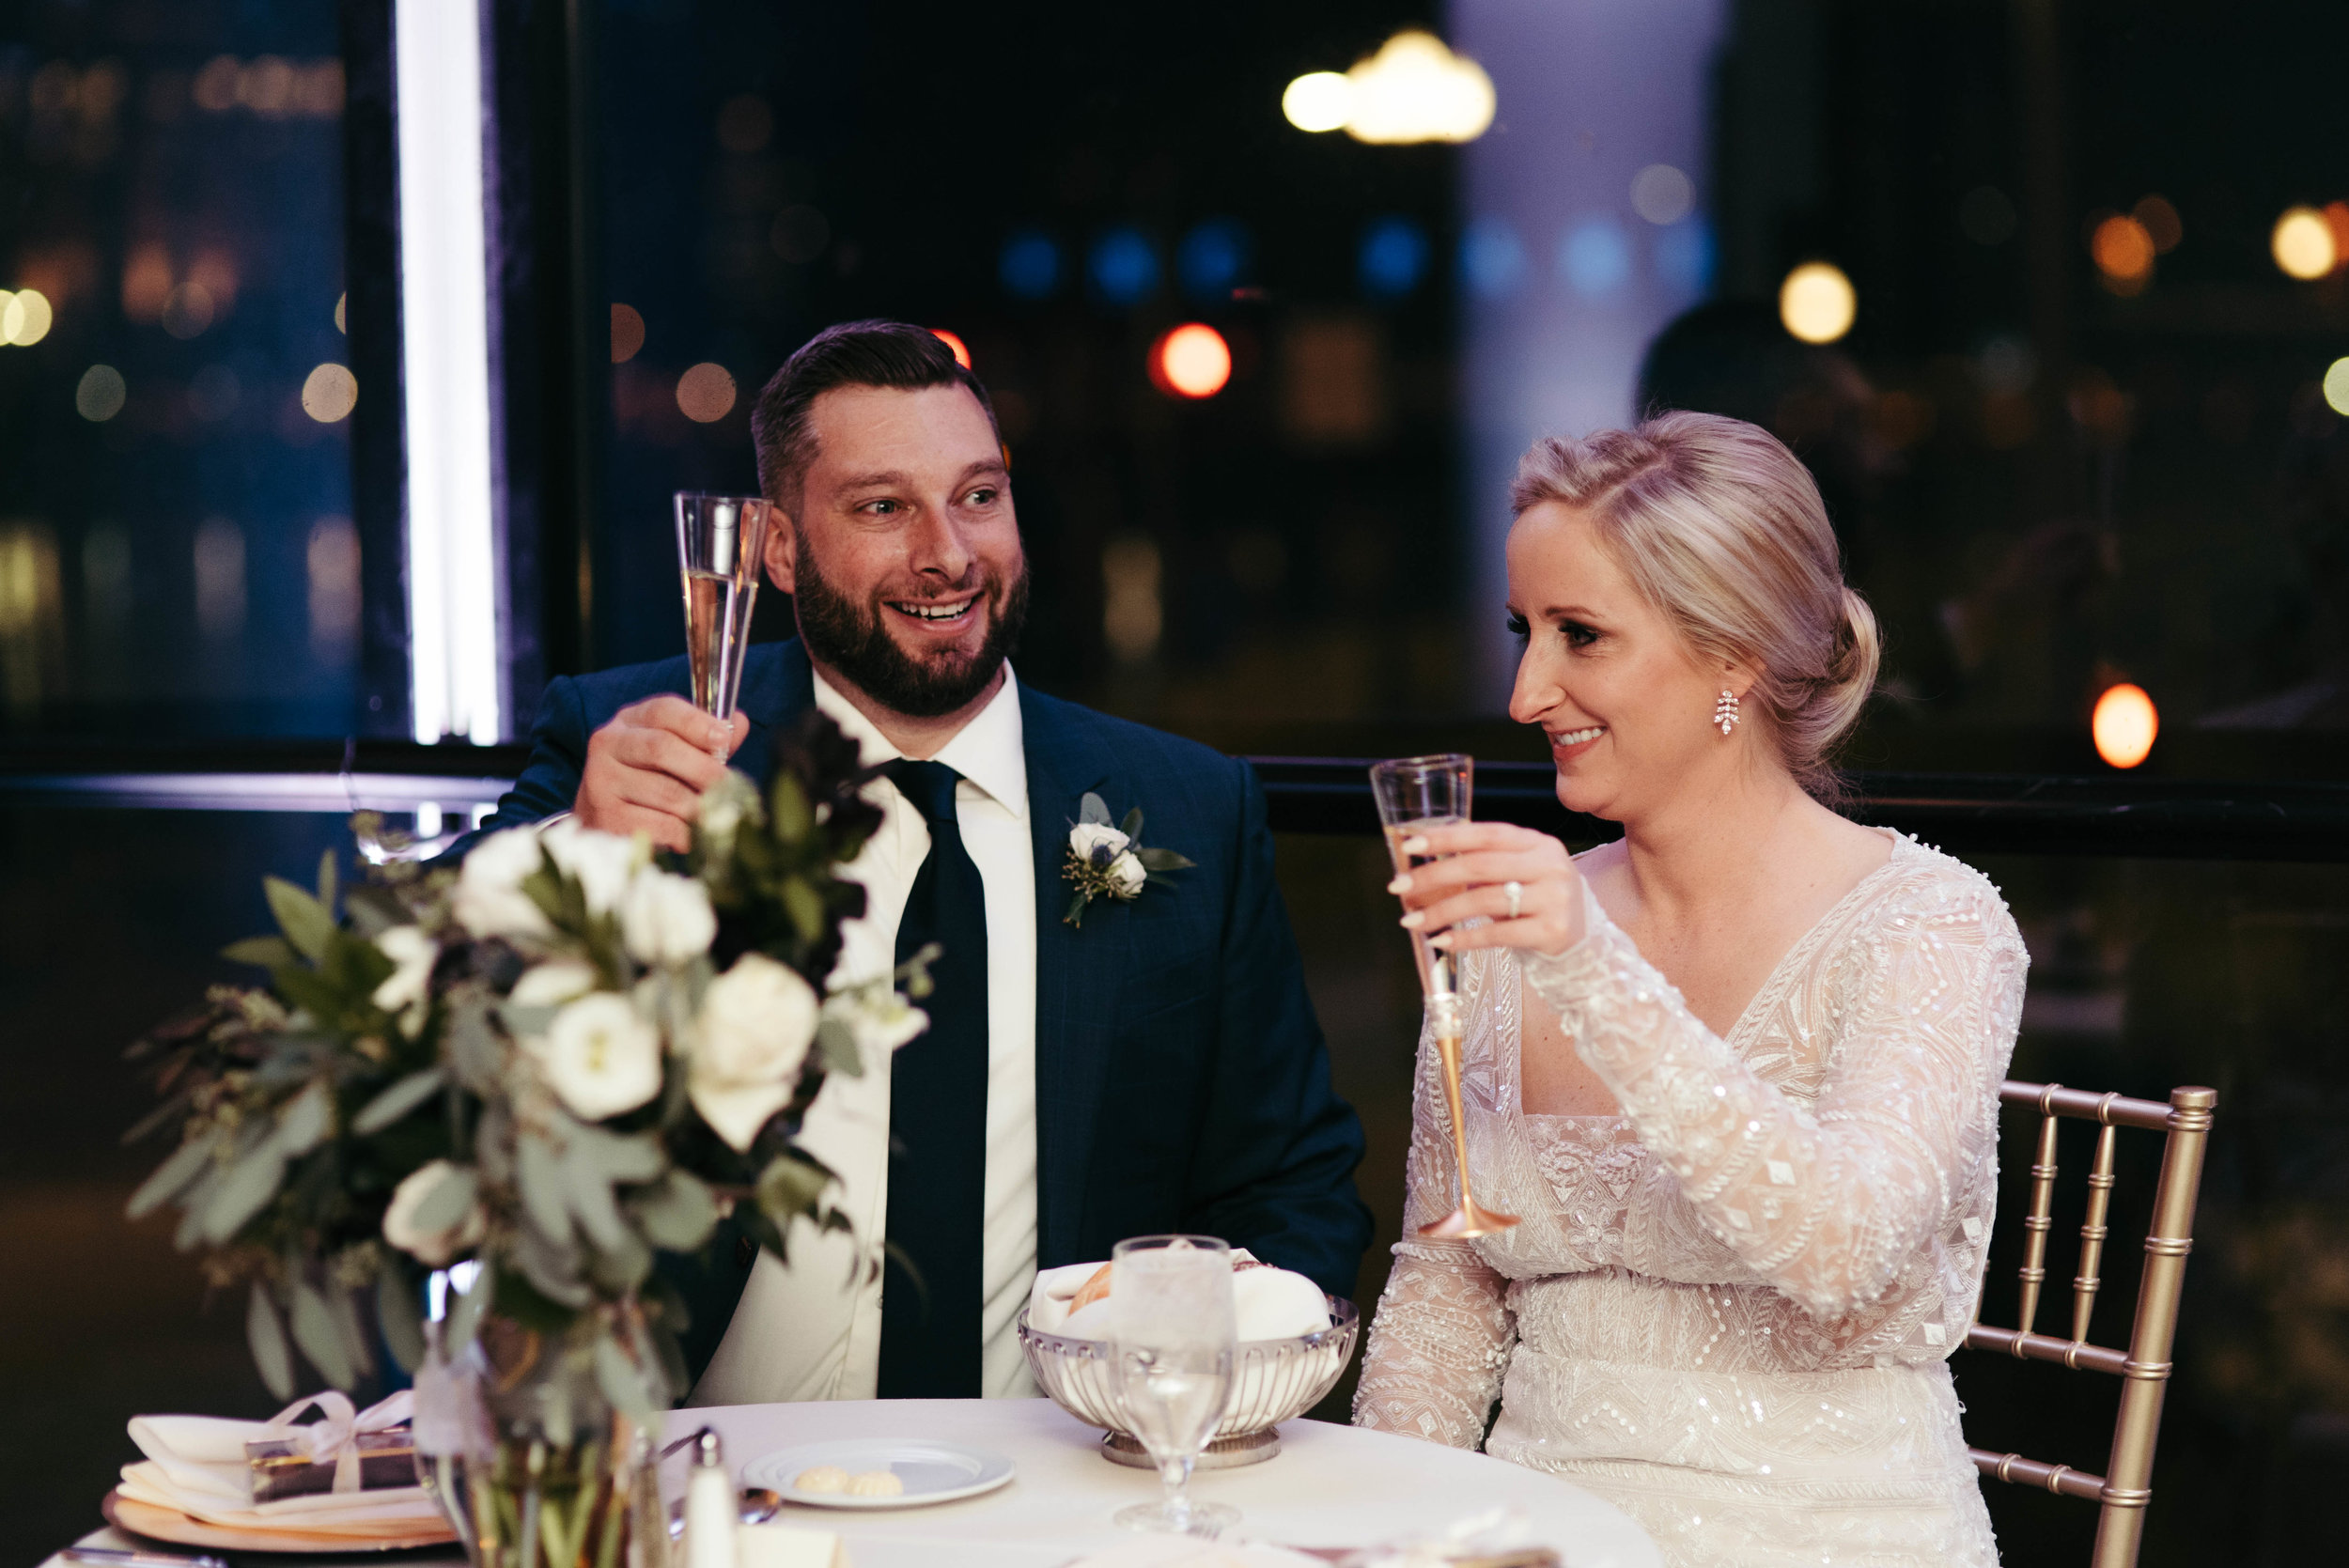 renaissance hotel wedding photos-49.jpg